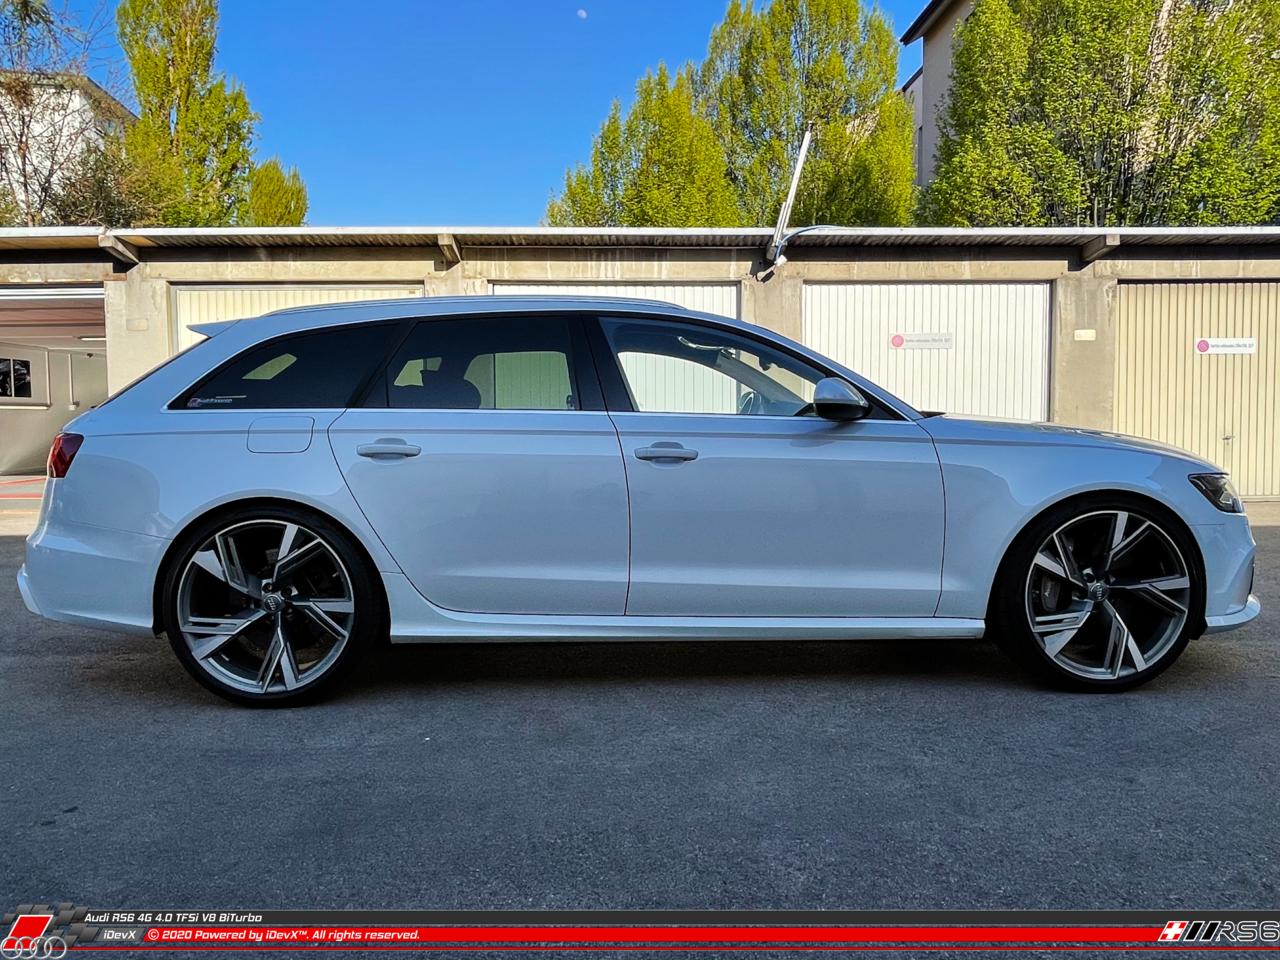 23.04.2021_Audi-RS6_iDevX_002.png